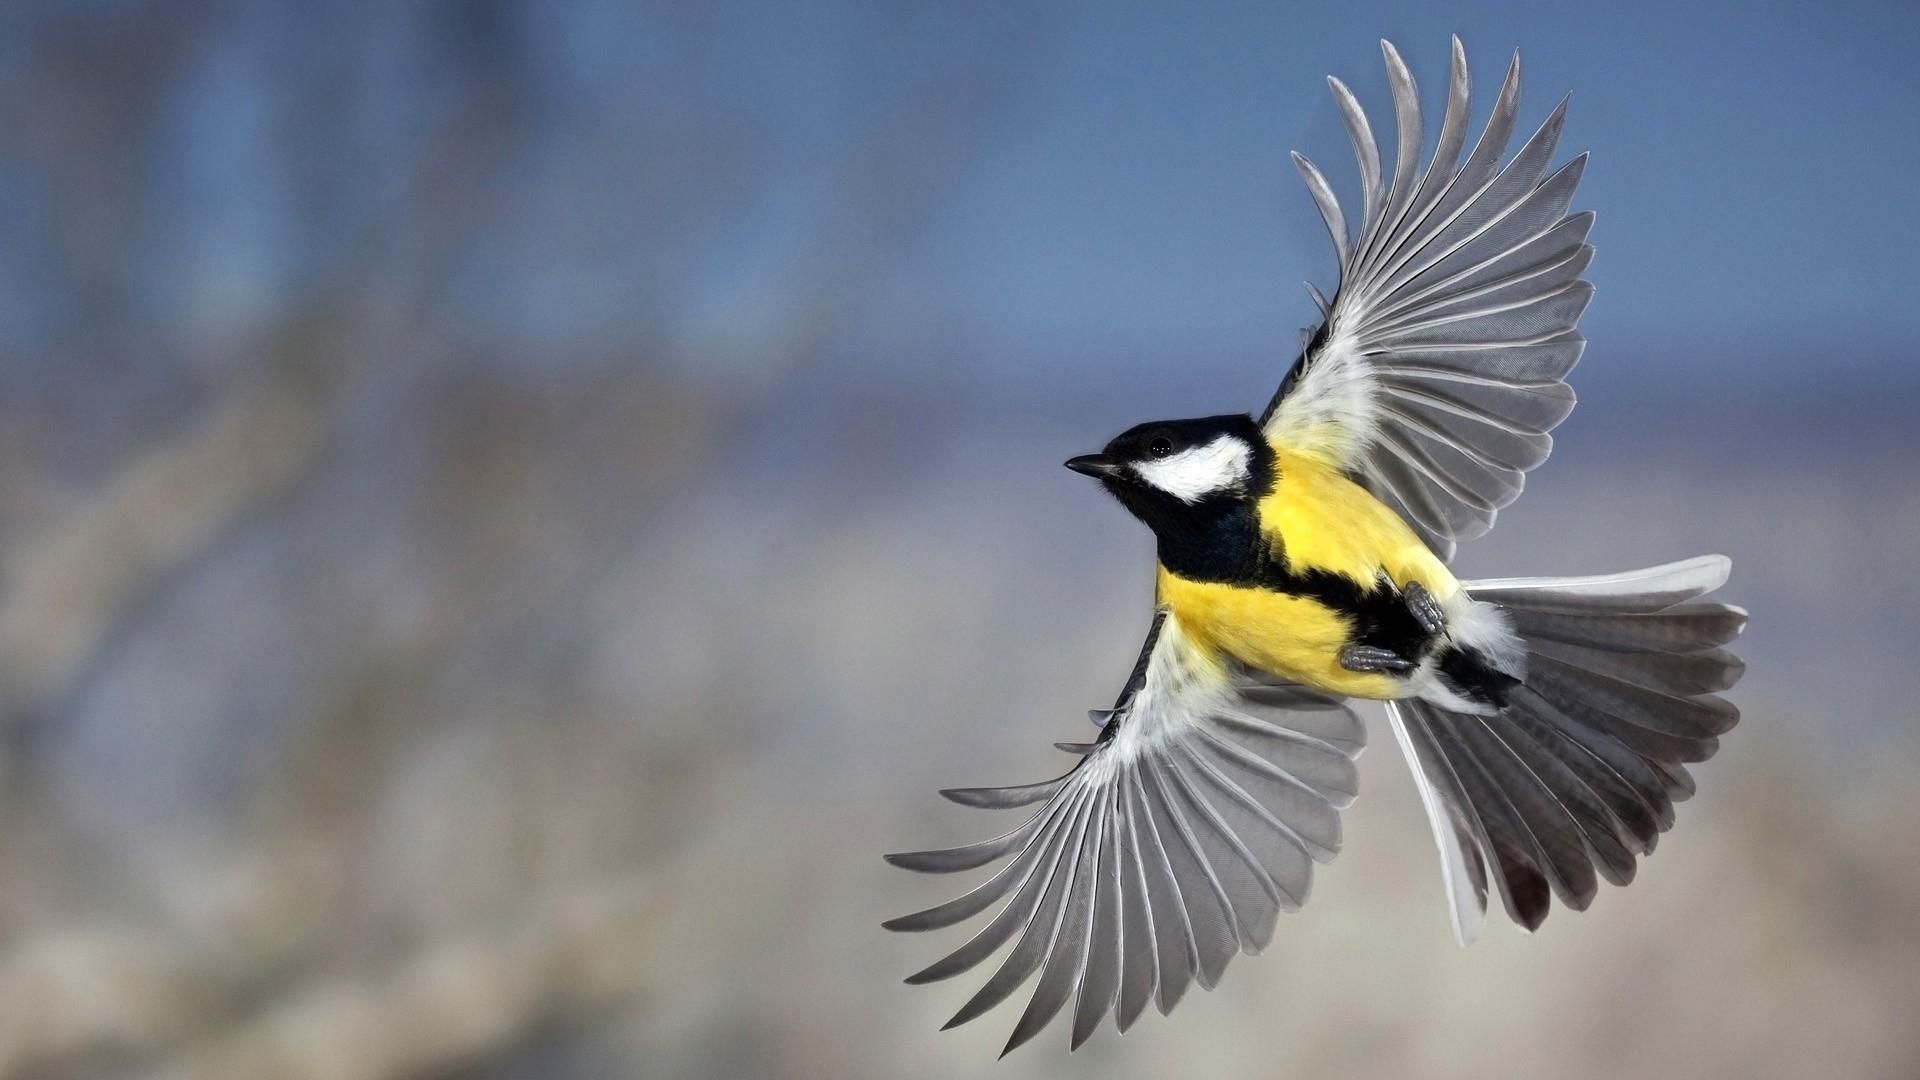 download wallpaper 1920x1080 tit bird flying small full